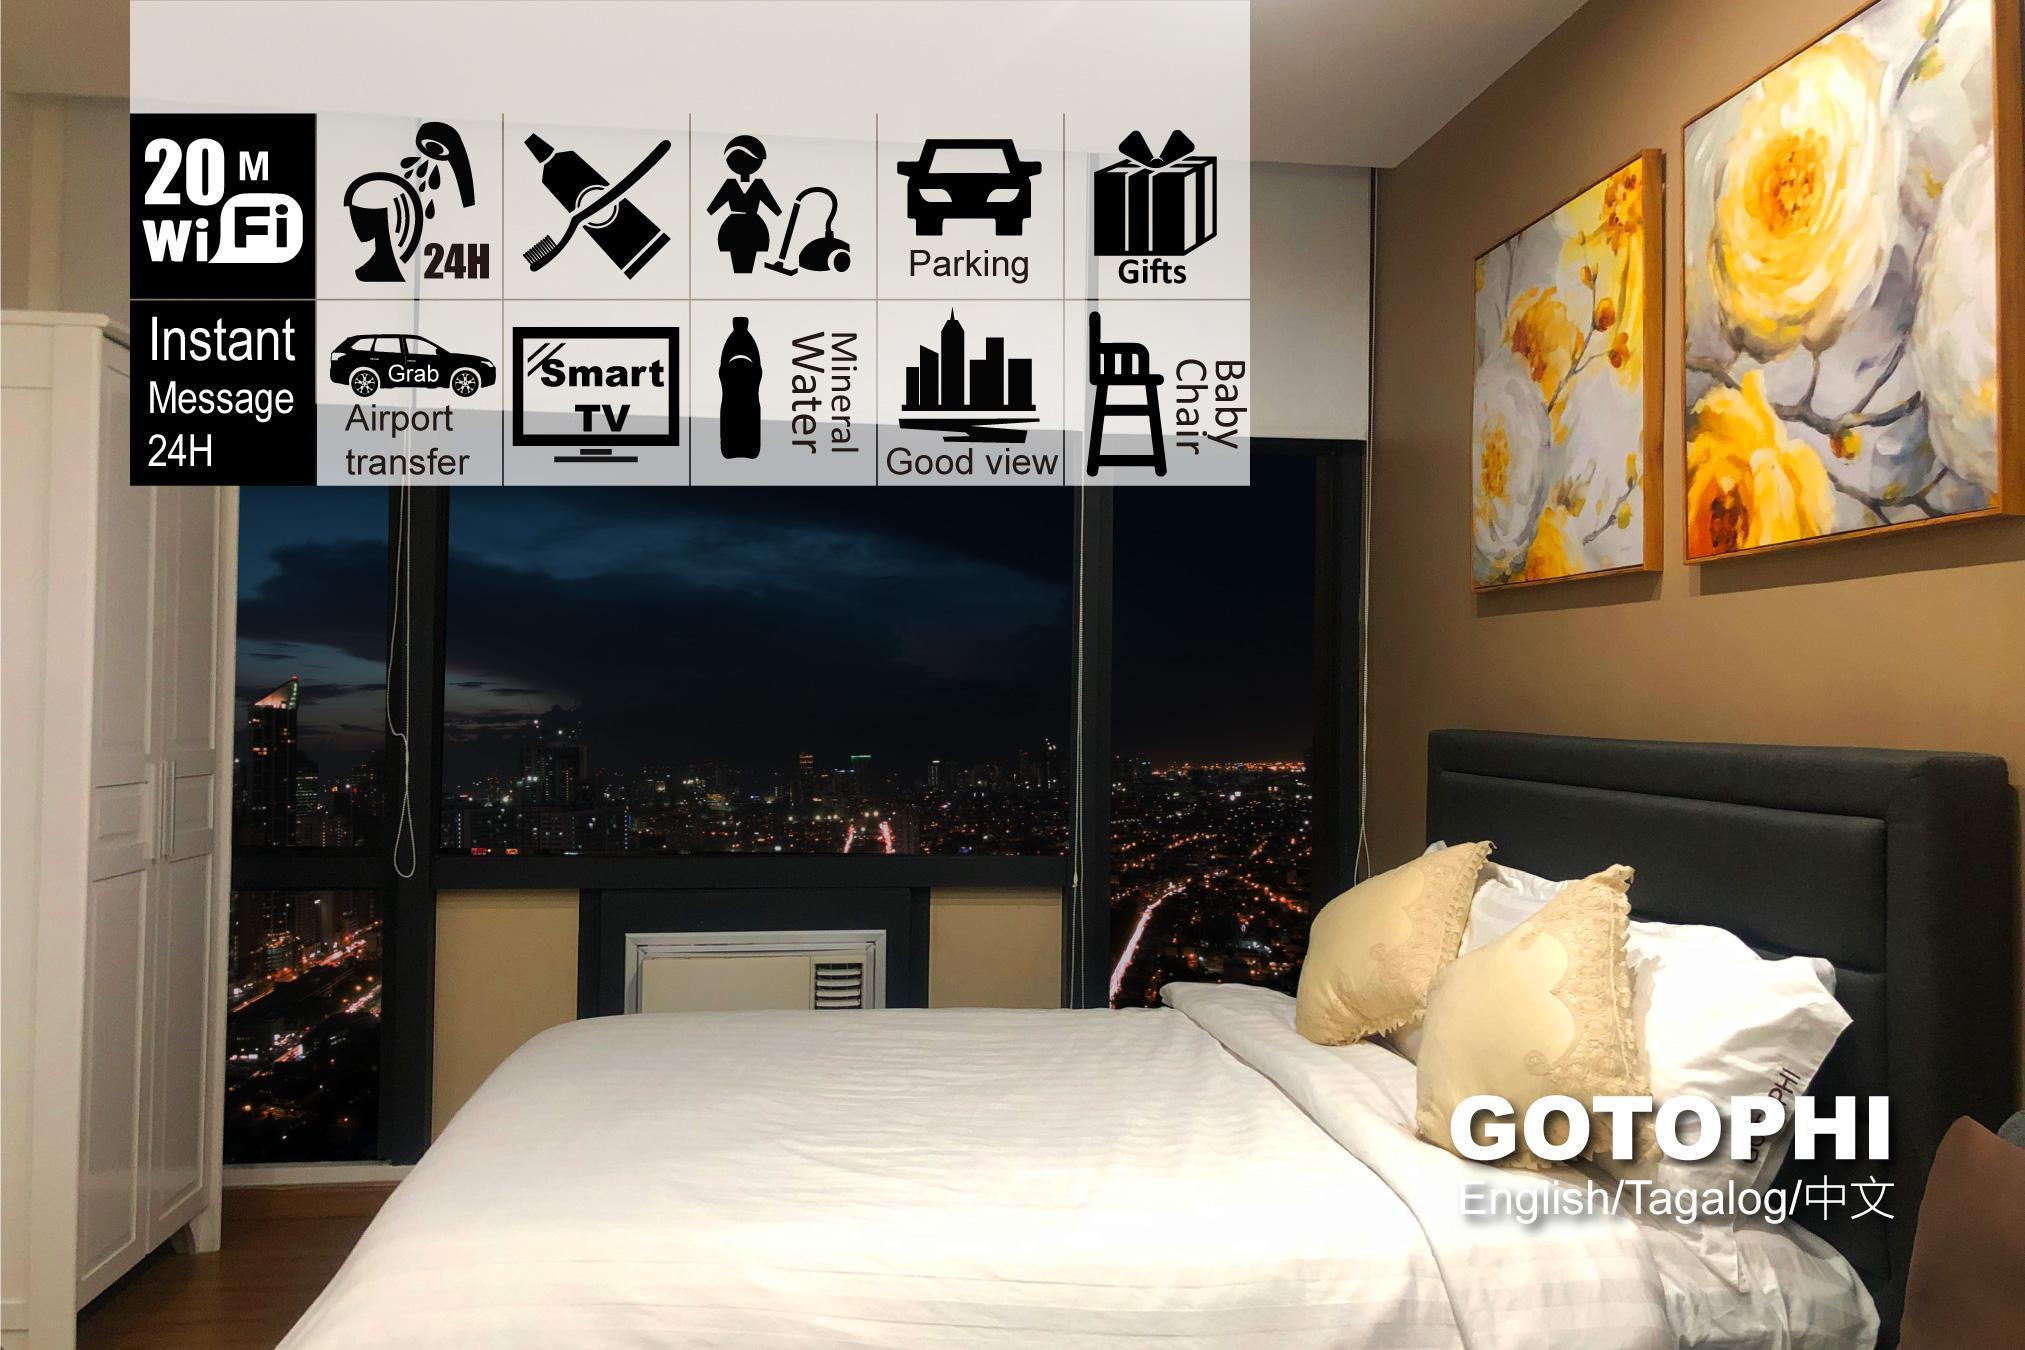 Gotophi Luxurious 5Star Hotel Gramercy Makati 5317